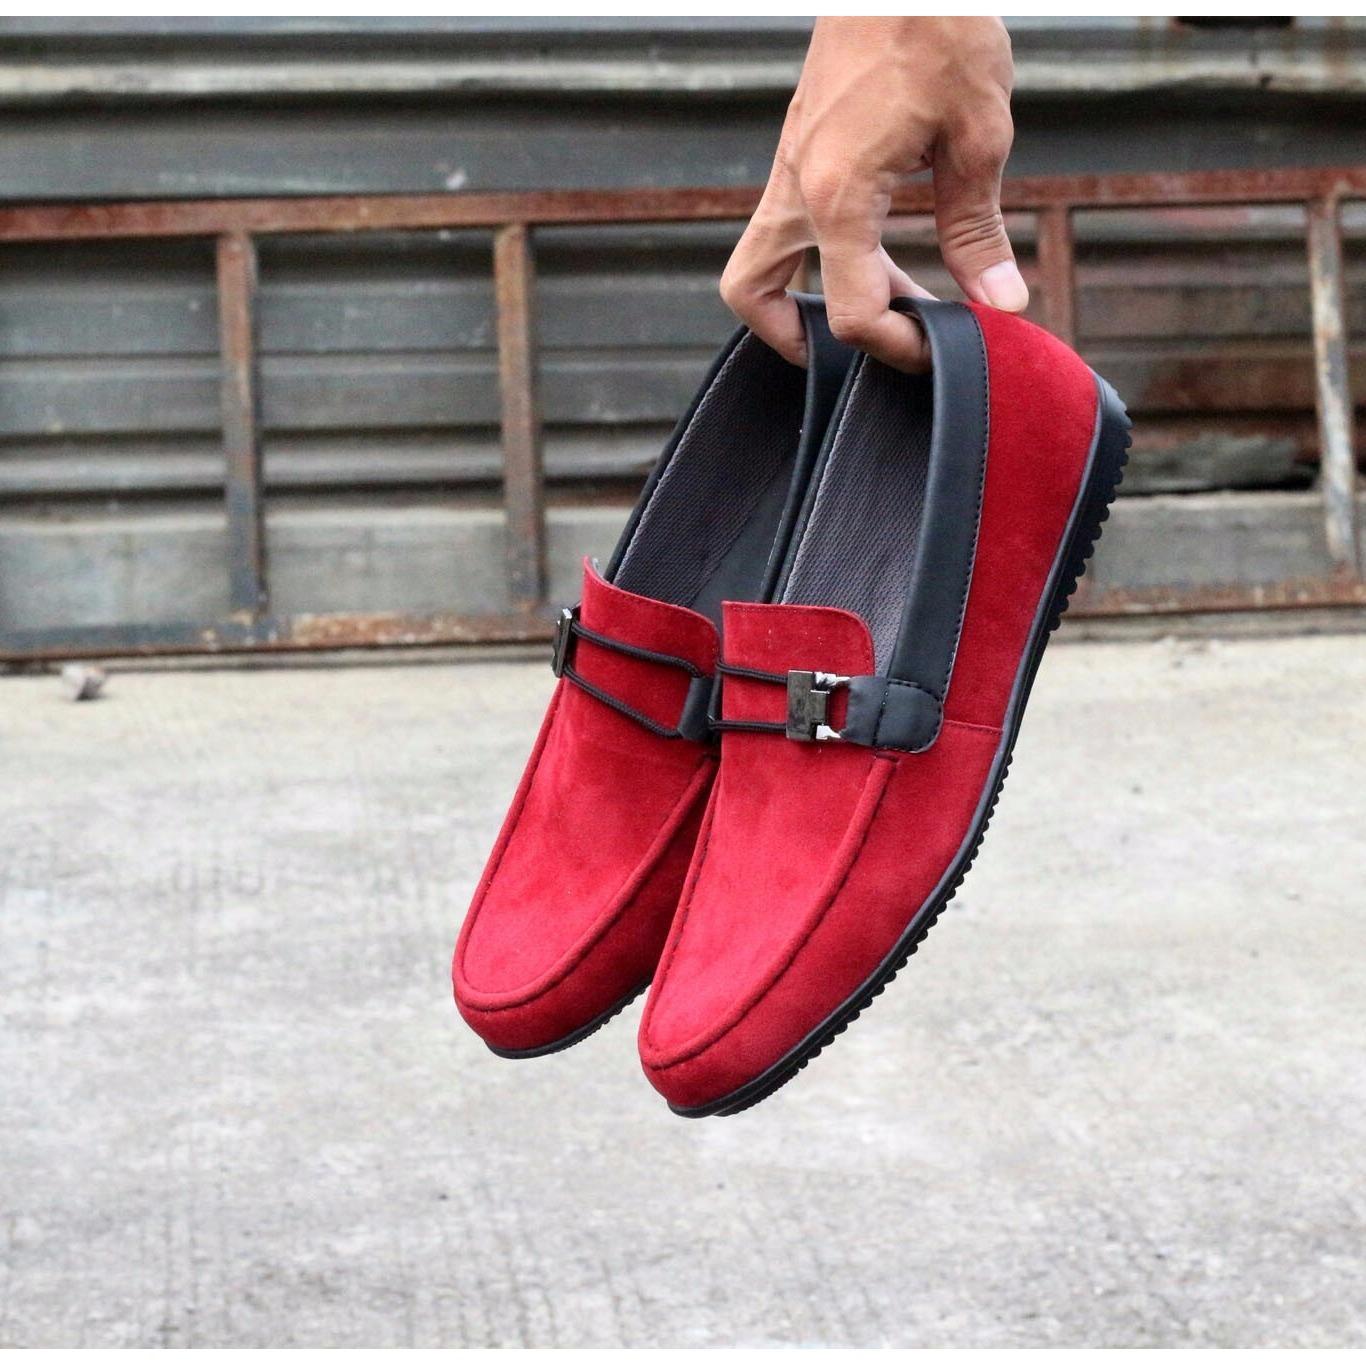 Cuci Gudang Kerak Store Sepatu Casual Slip On Loafer Pria